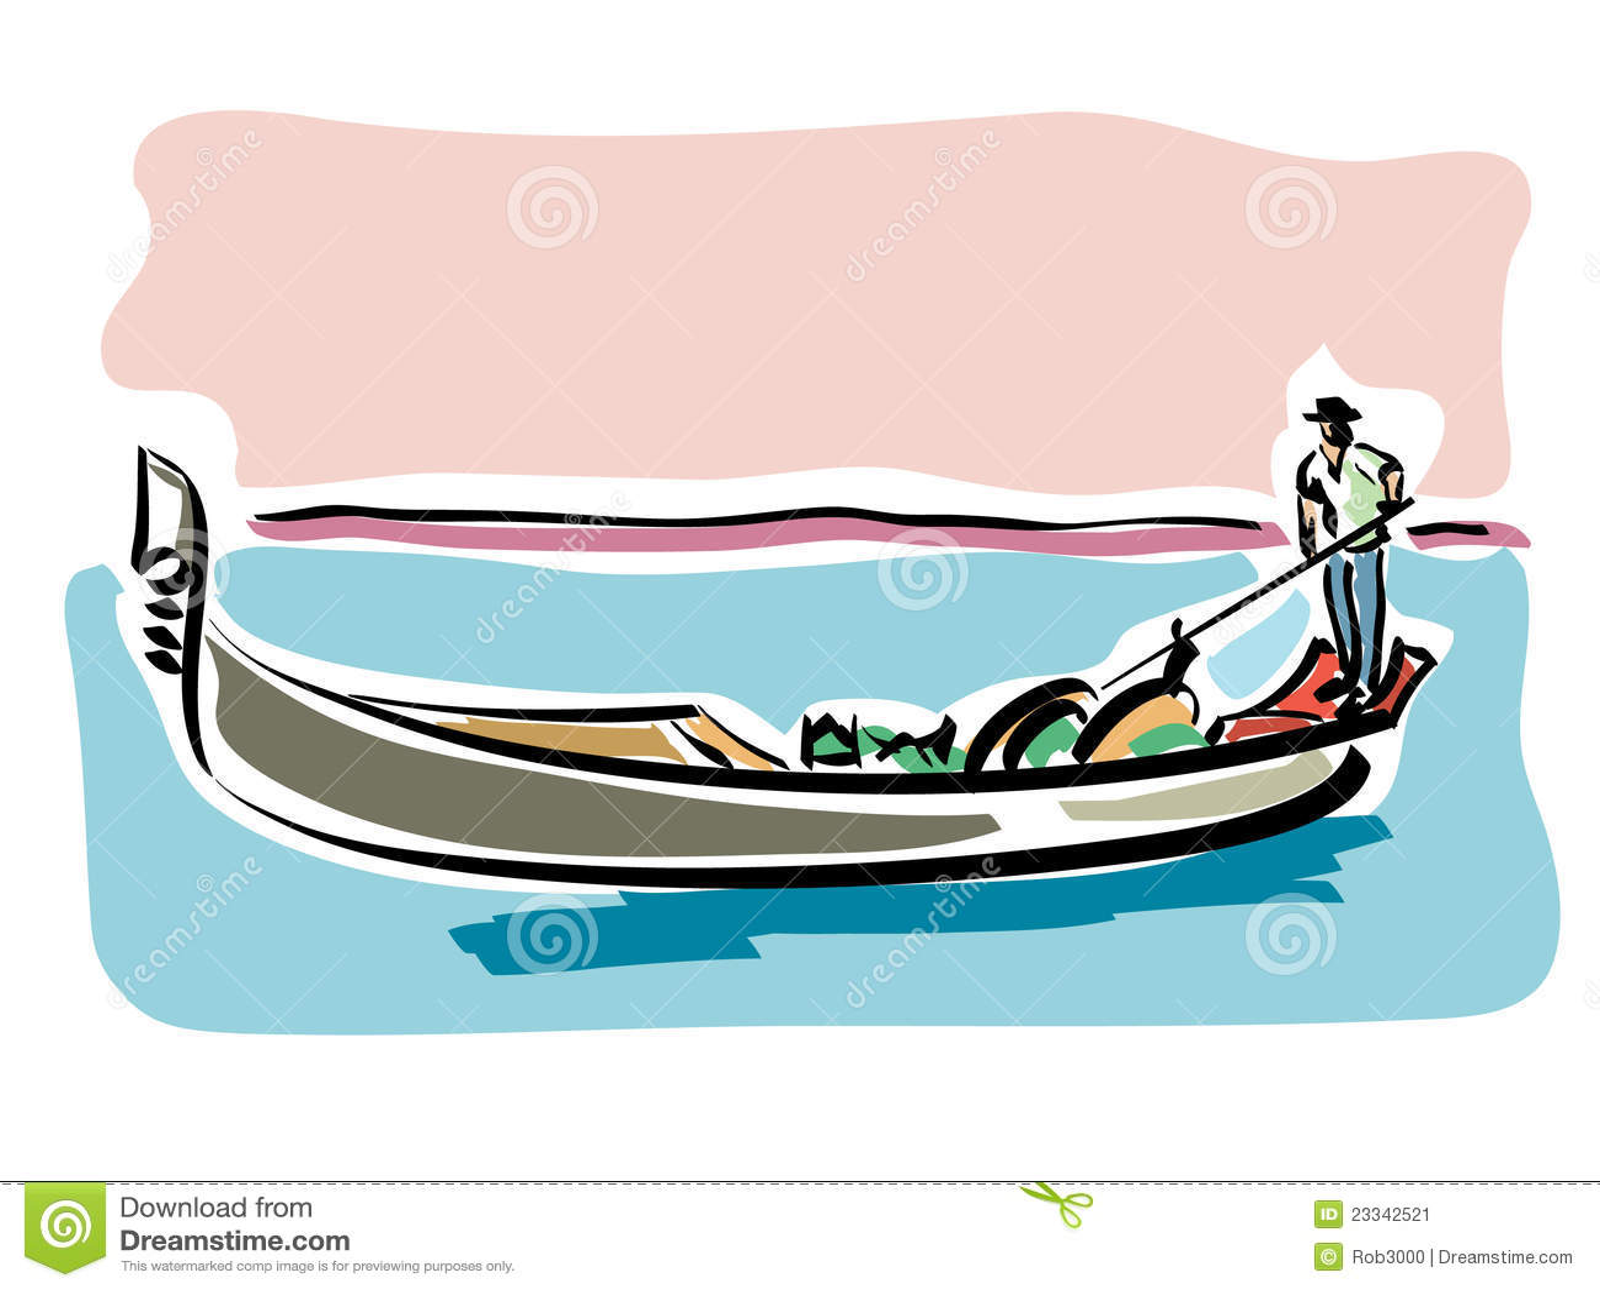 Rowing Gondola Stock Illustrations – 49 Rowing Gondola Stock ...